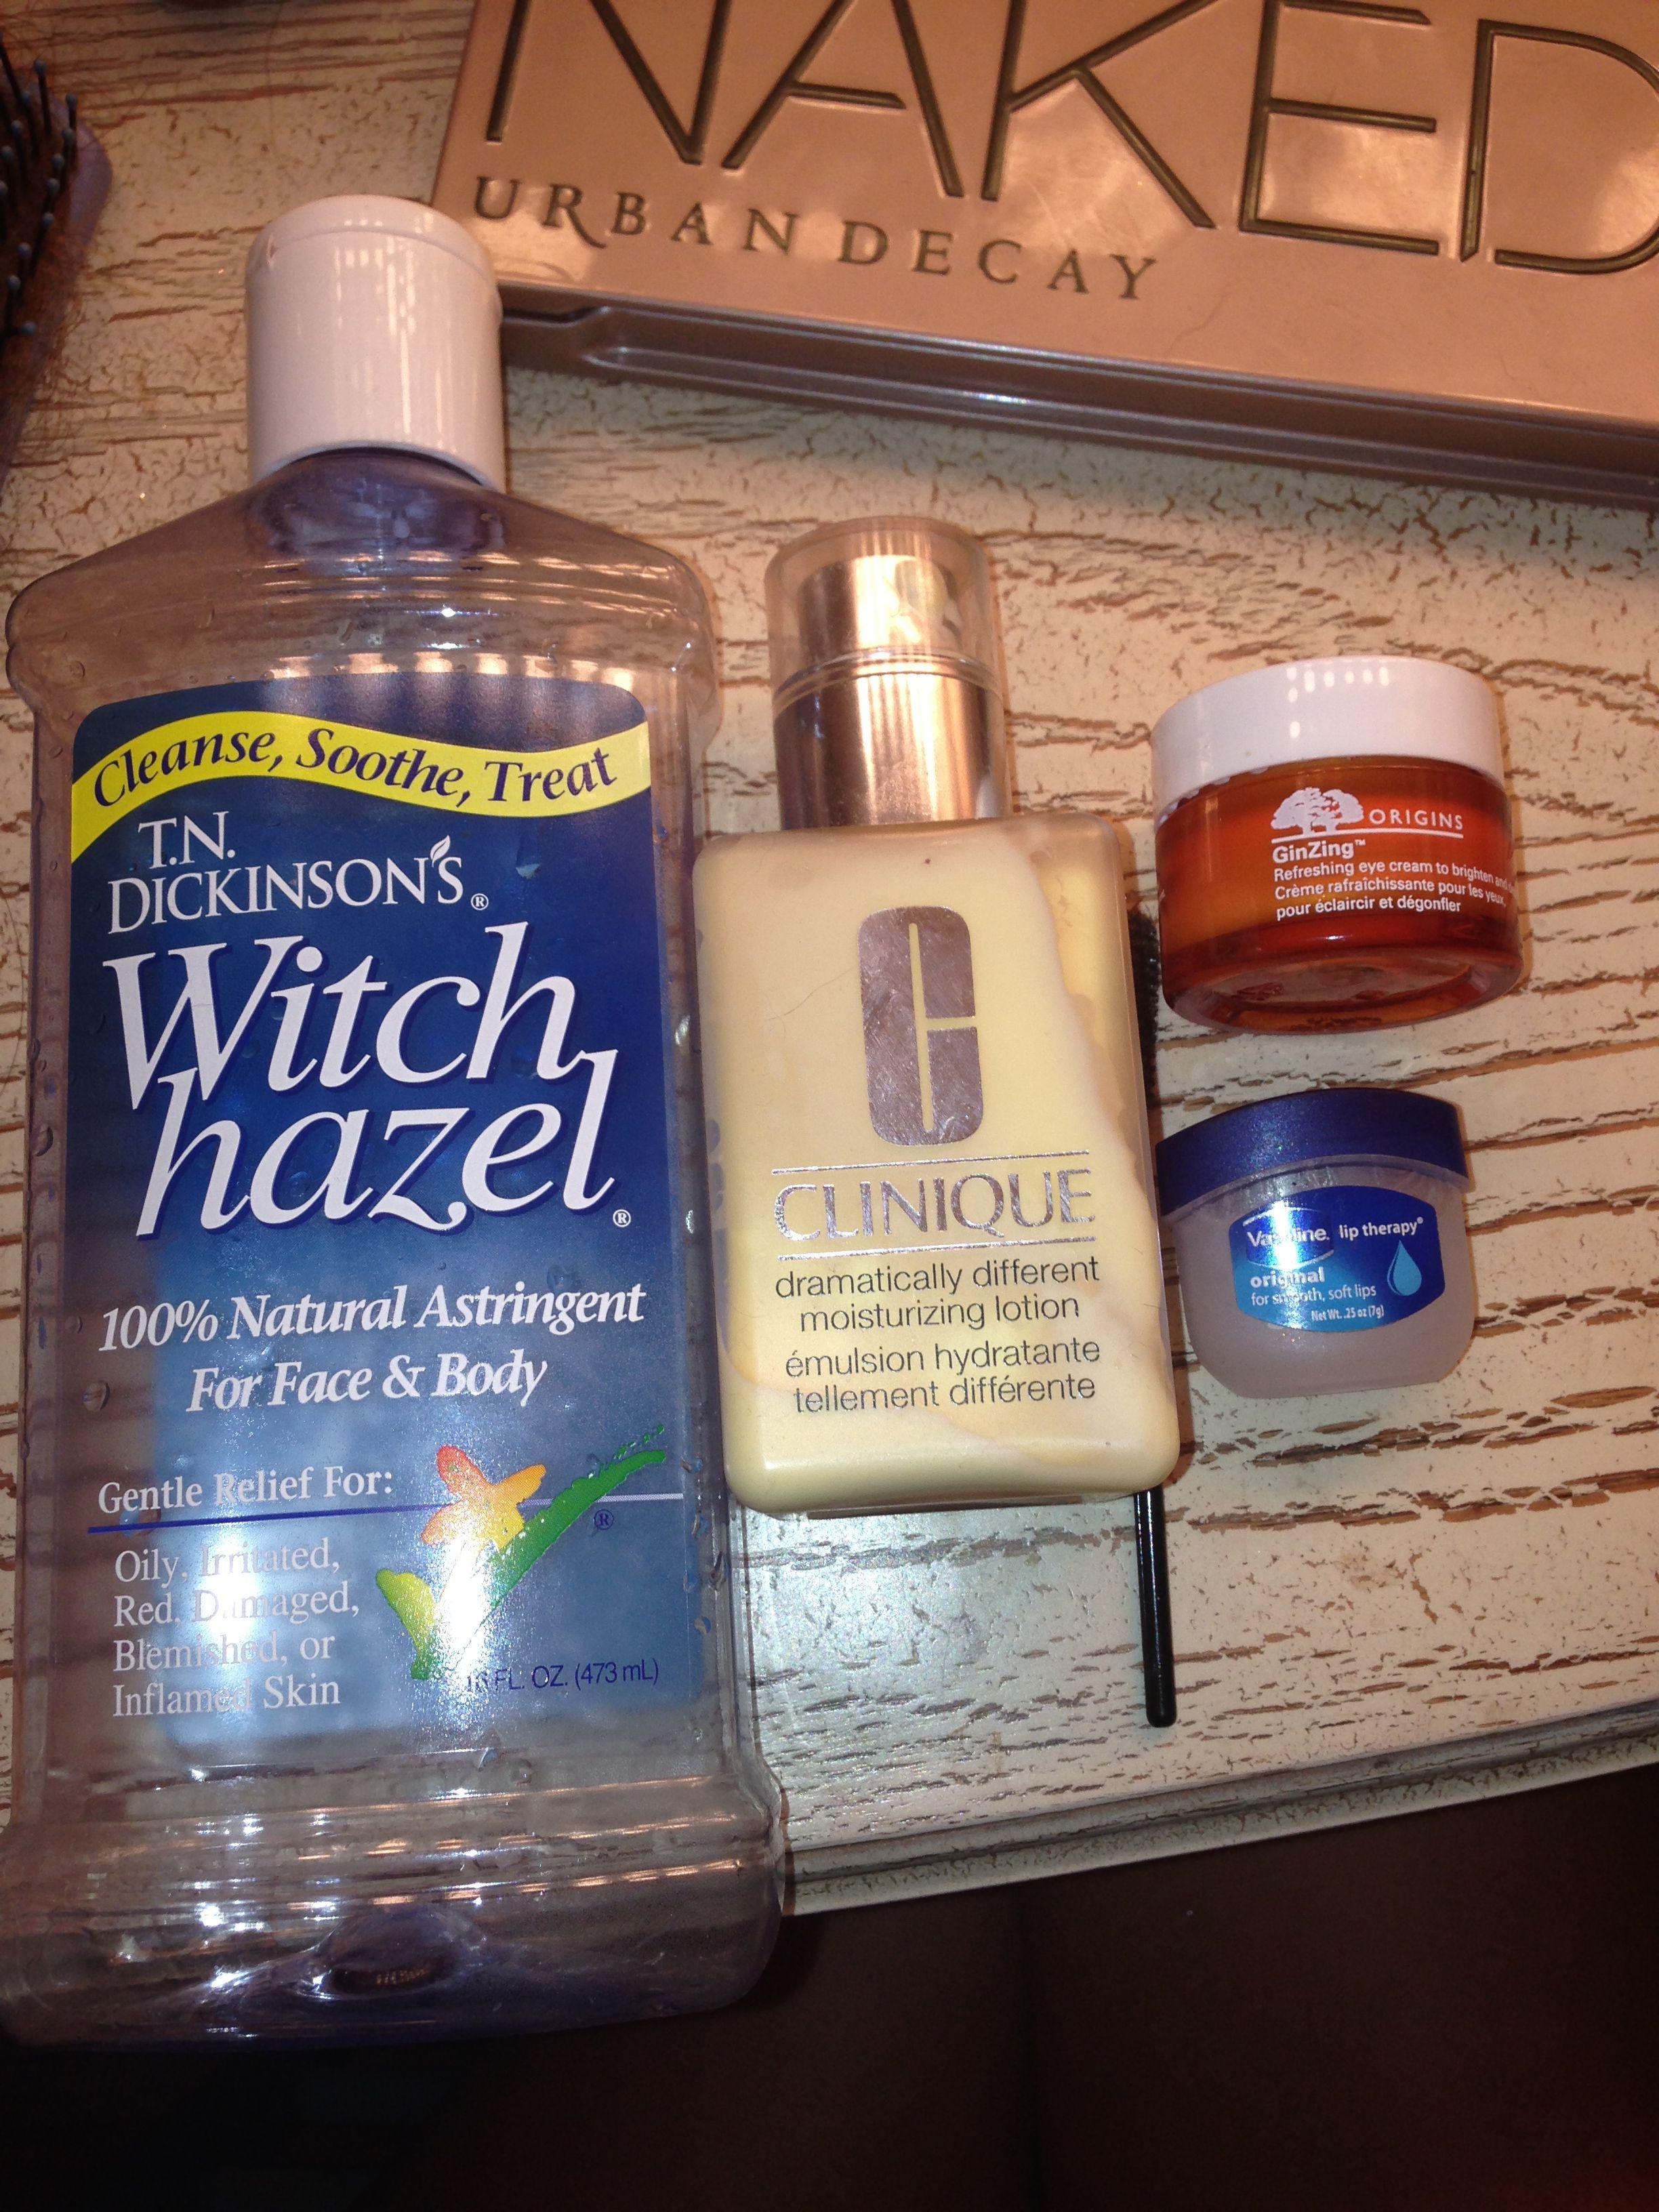 My Night Time Routine 1 I Apply Witch Hazel As My Astringent 2 I